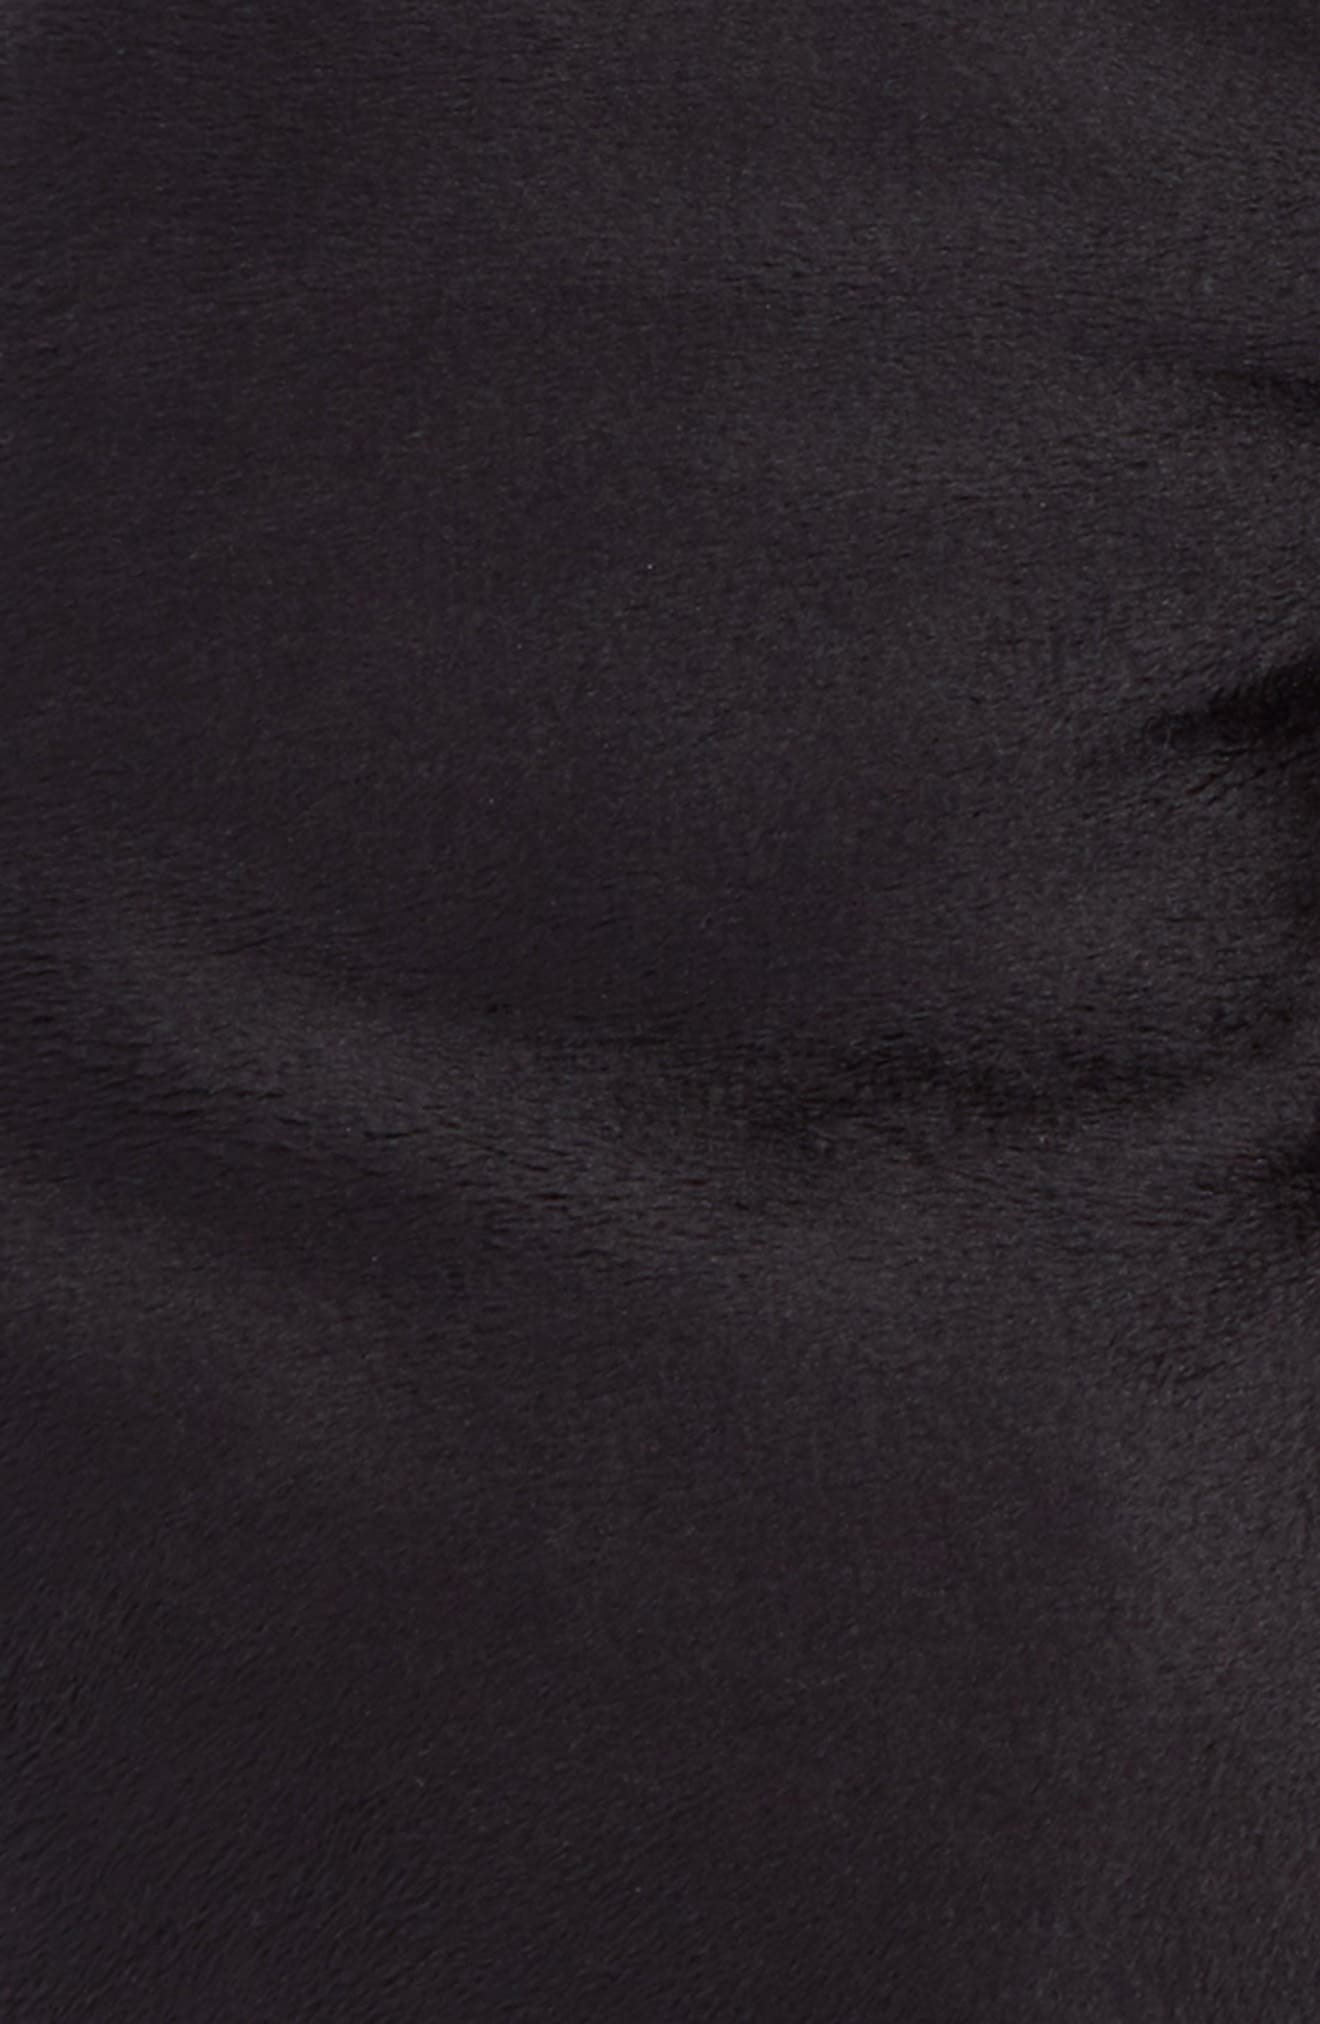 Alternate Image 2  - Sonoma Lavender Solid Black Neck Pillow